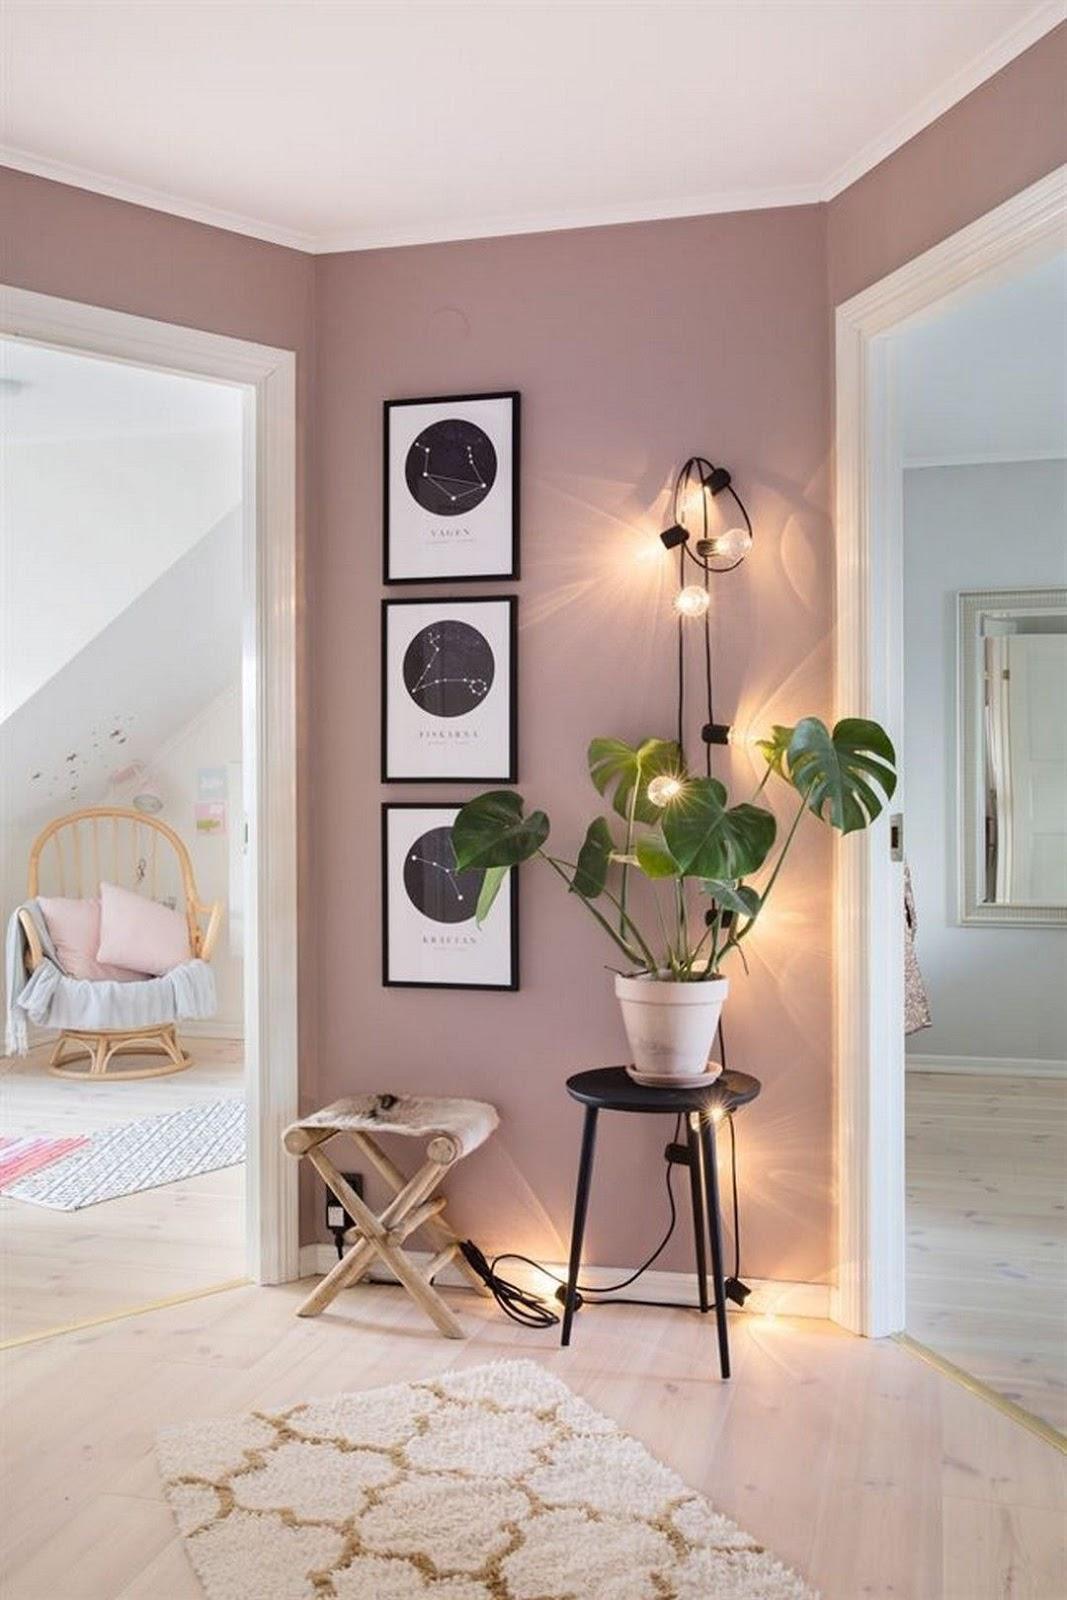 parede colorida rosa queimado